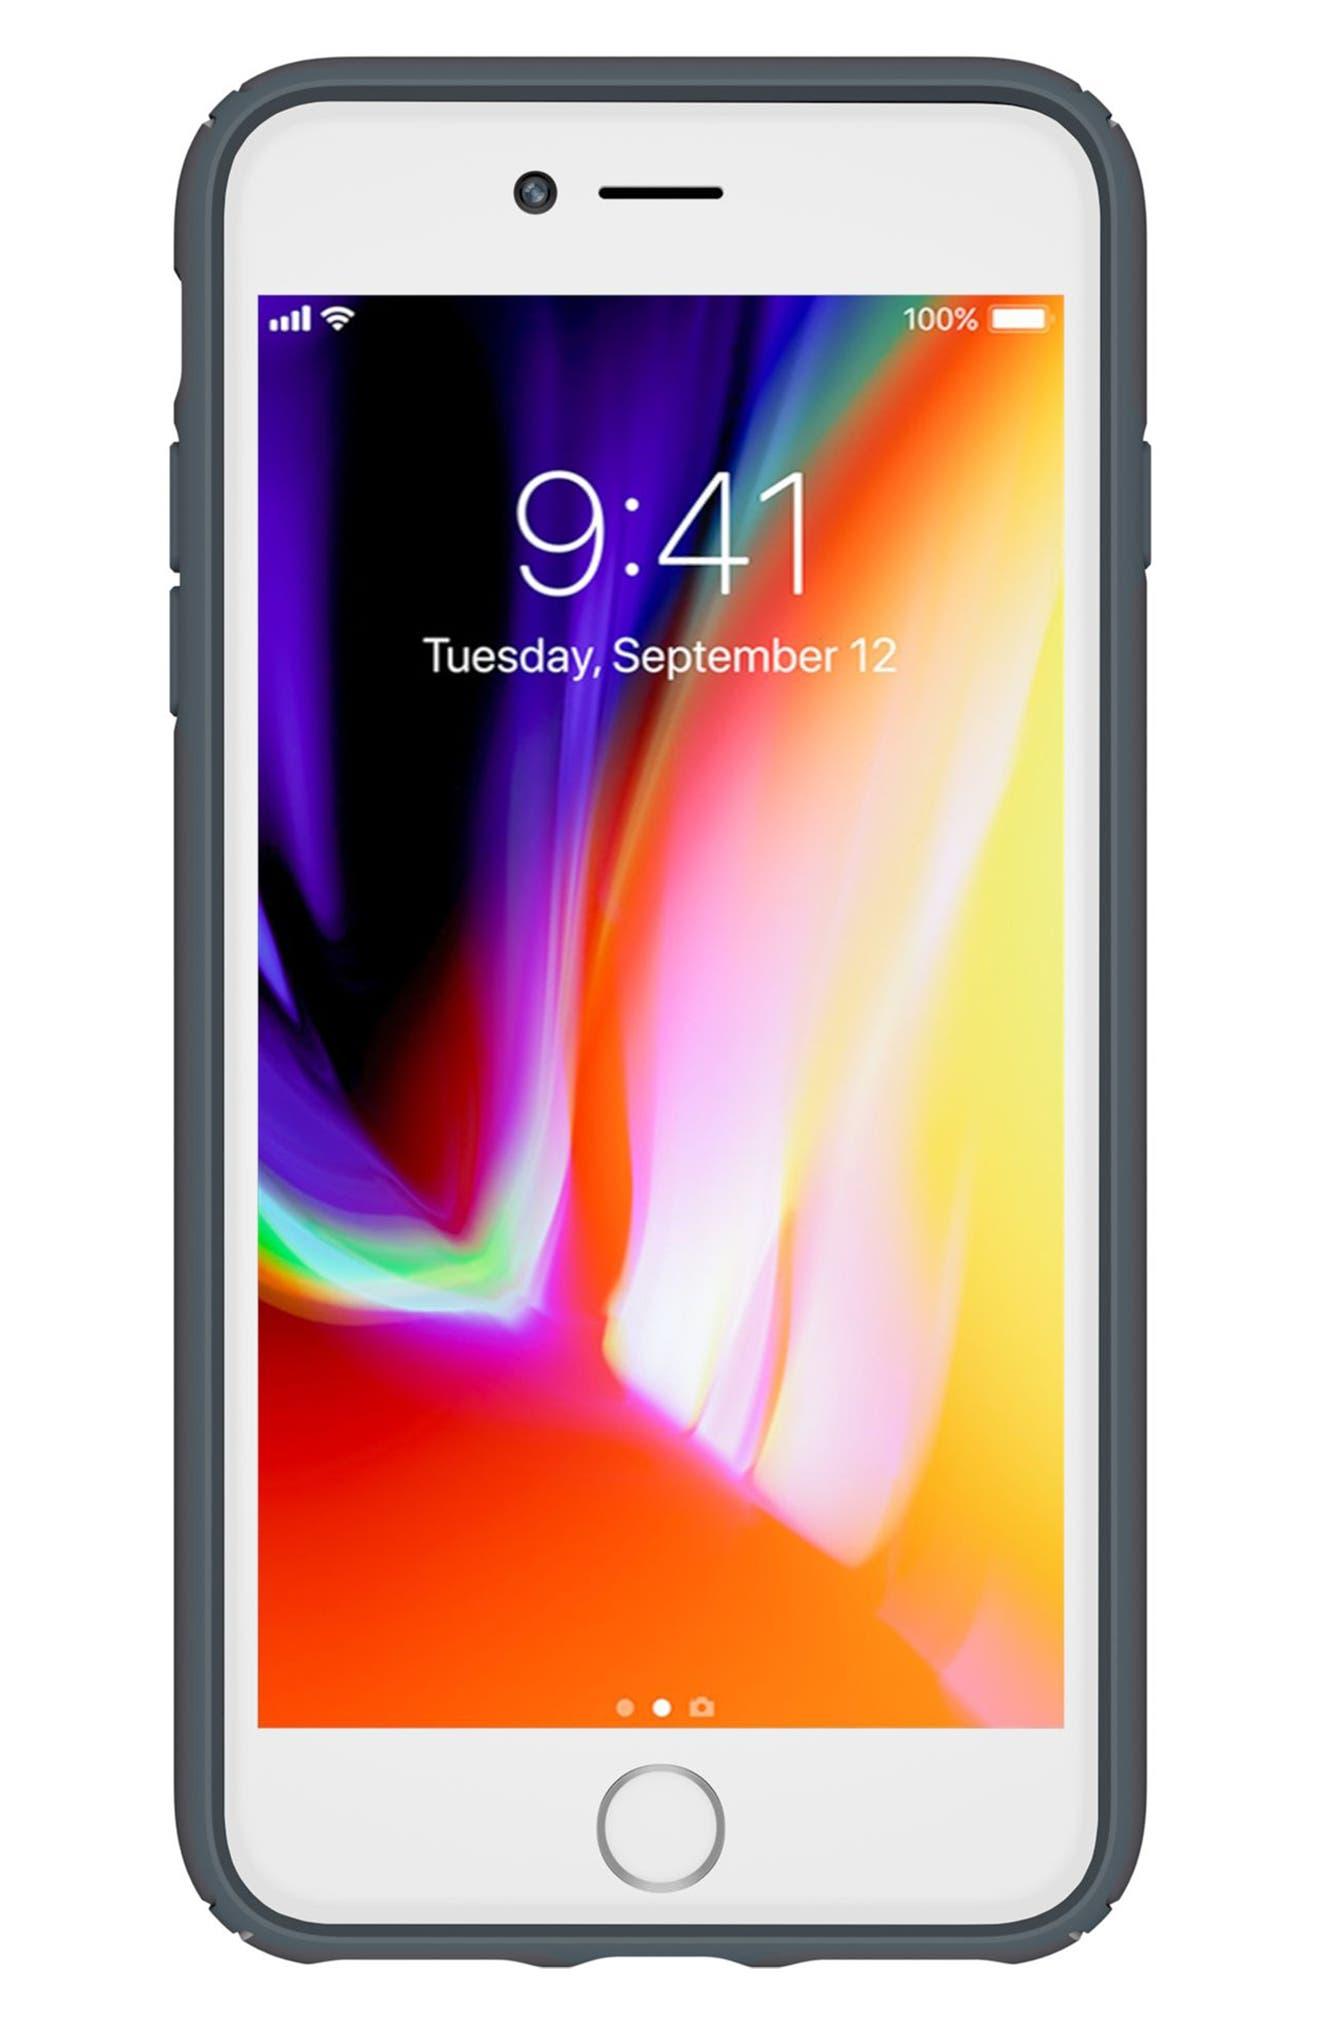 iPhone 6/6s/7/8 Case,                             Alternate thumbnail 8, color,                             Tungsten Grey Metallic/ Grey